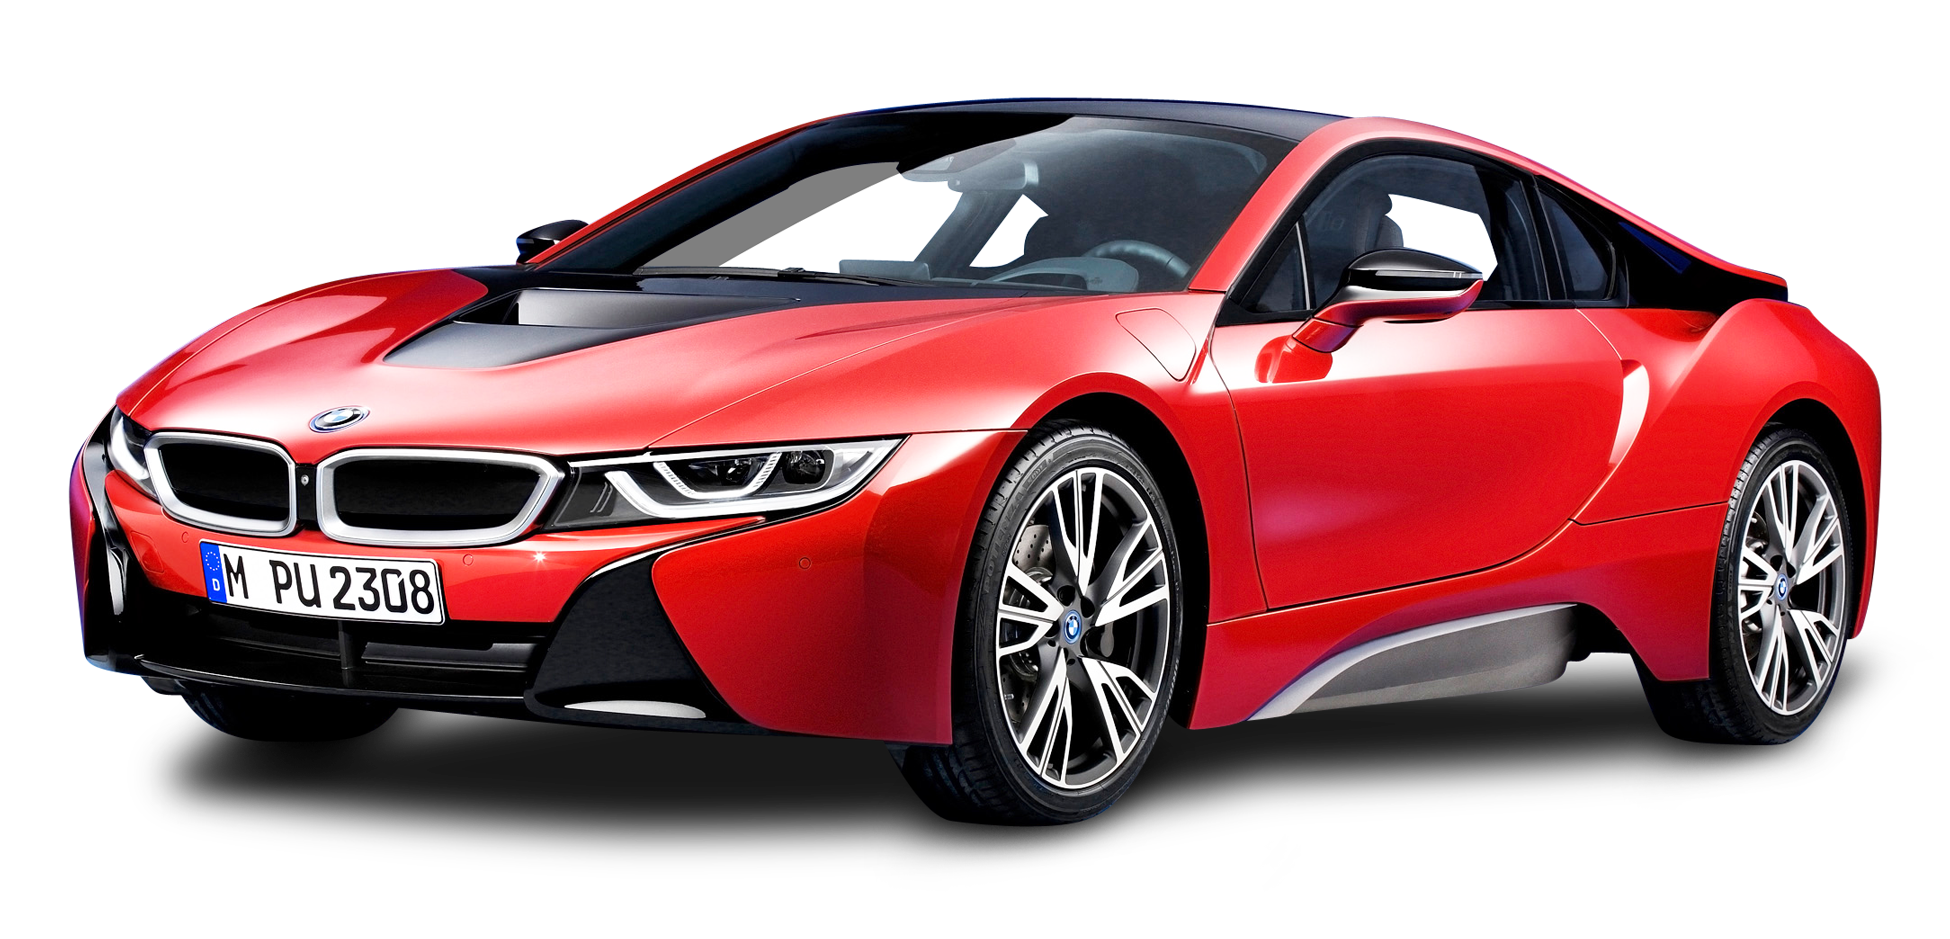 Bmw I8 Protonic Red Car Png Image Bmw I8 Car Images Bmw